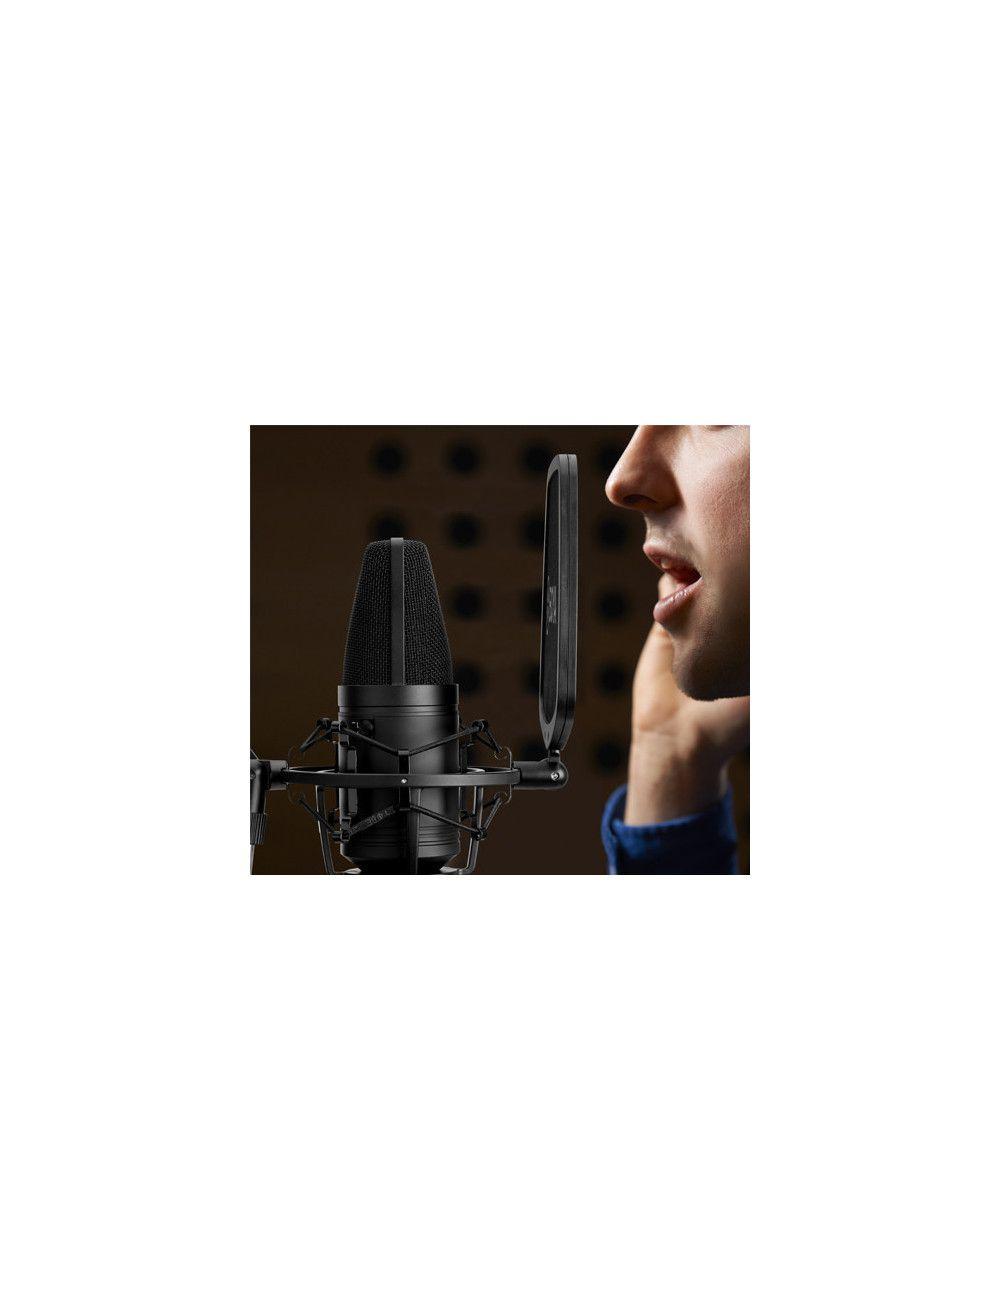 Grabadora de Audio Portátil ZOOM R28 en Chile www.apertura.cl